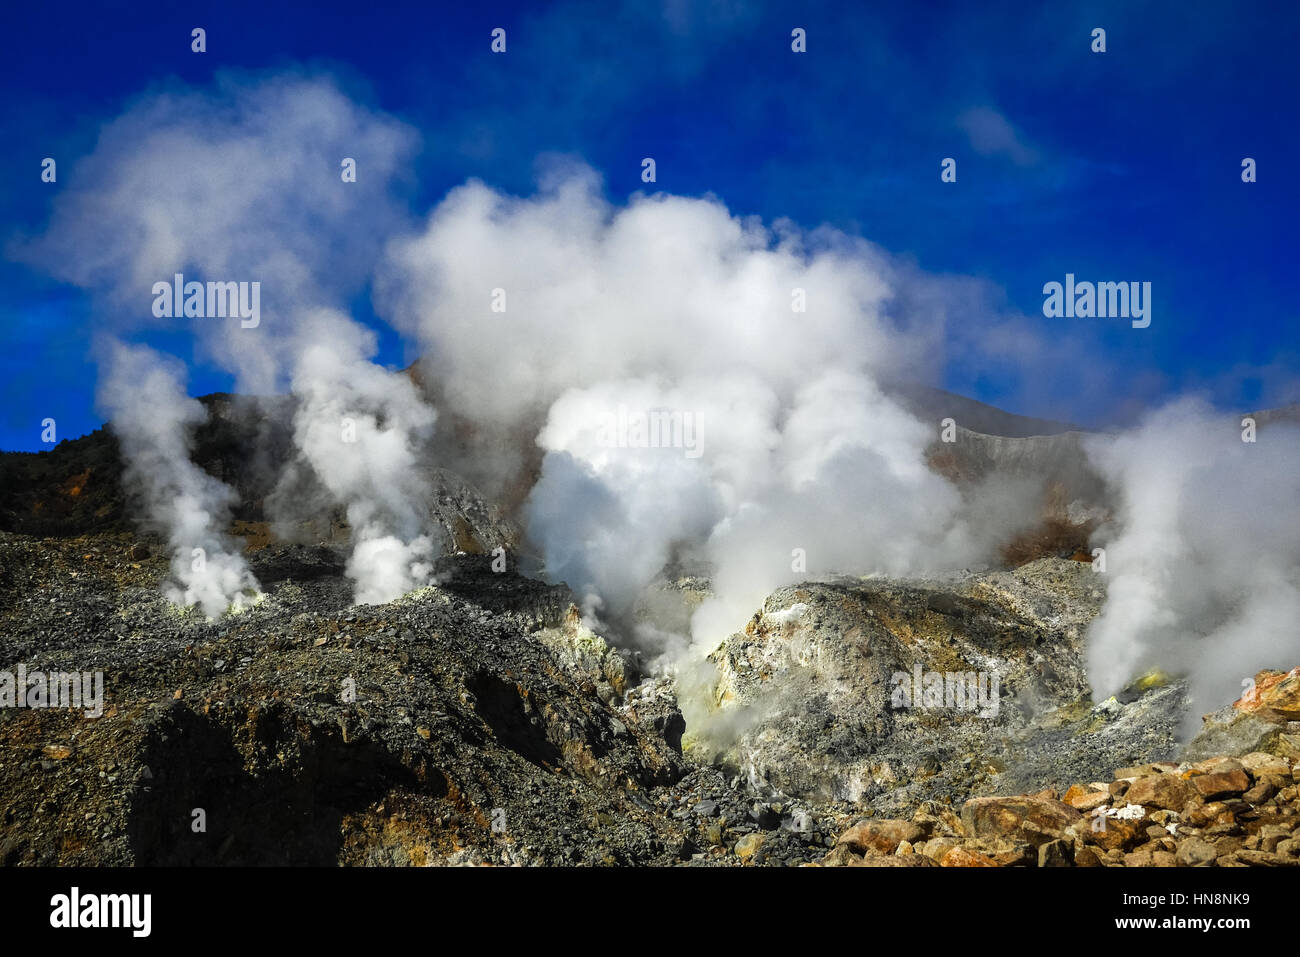 Fumaroles at the crater of Mount Papandayan volcano, Indonesia. © Reynold Sumayku - Stock Image